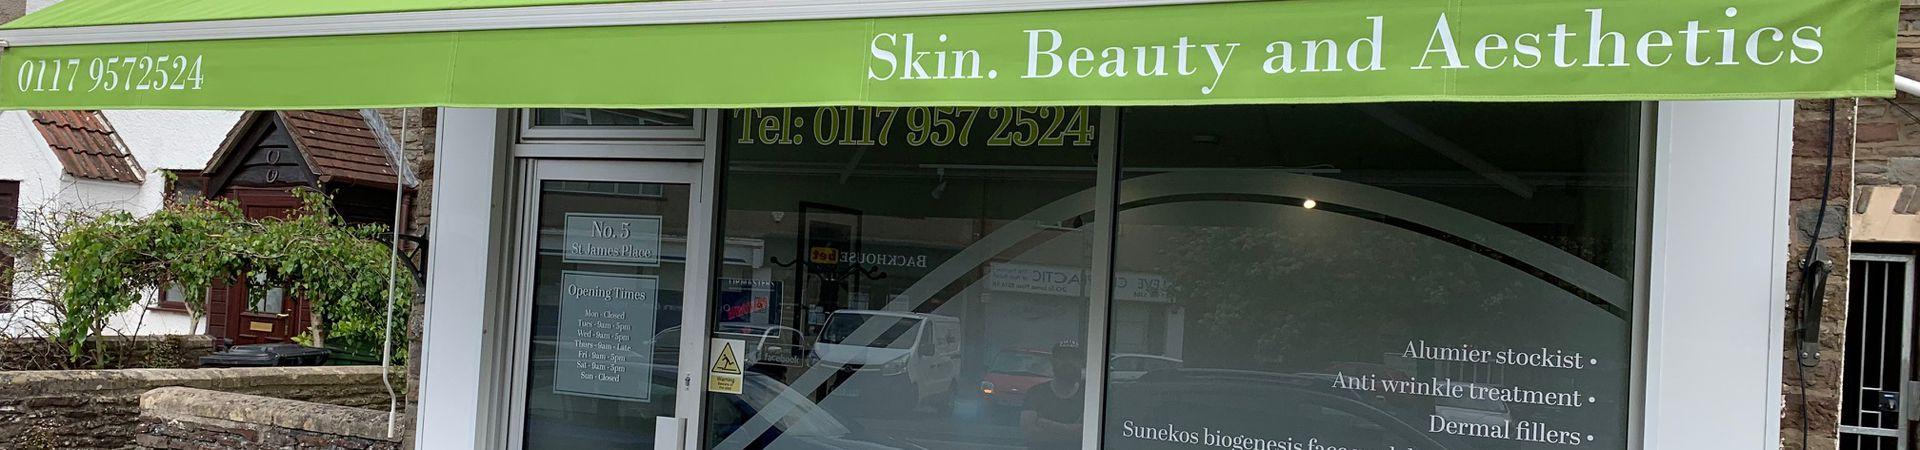 Impact Beauty and Aesthetics Salon Slide